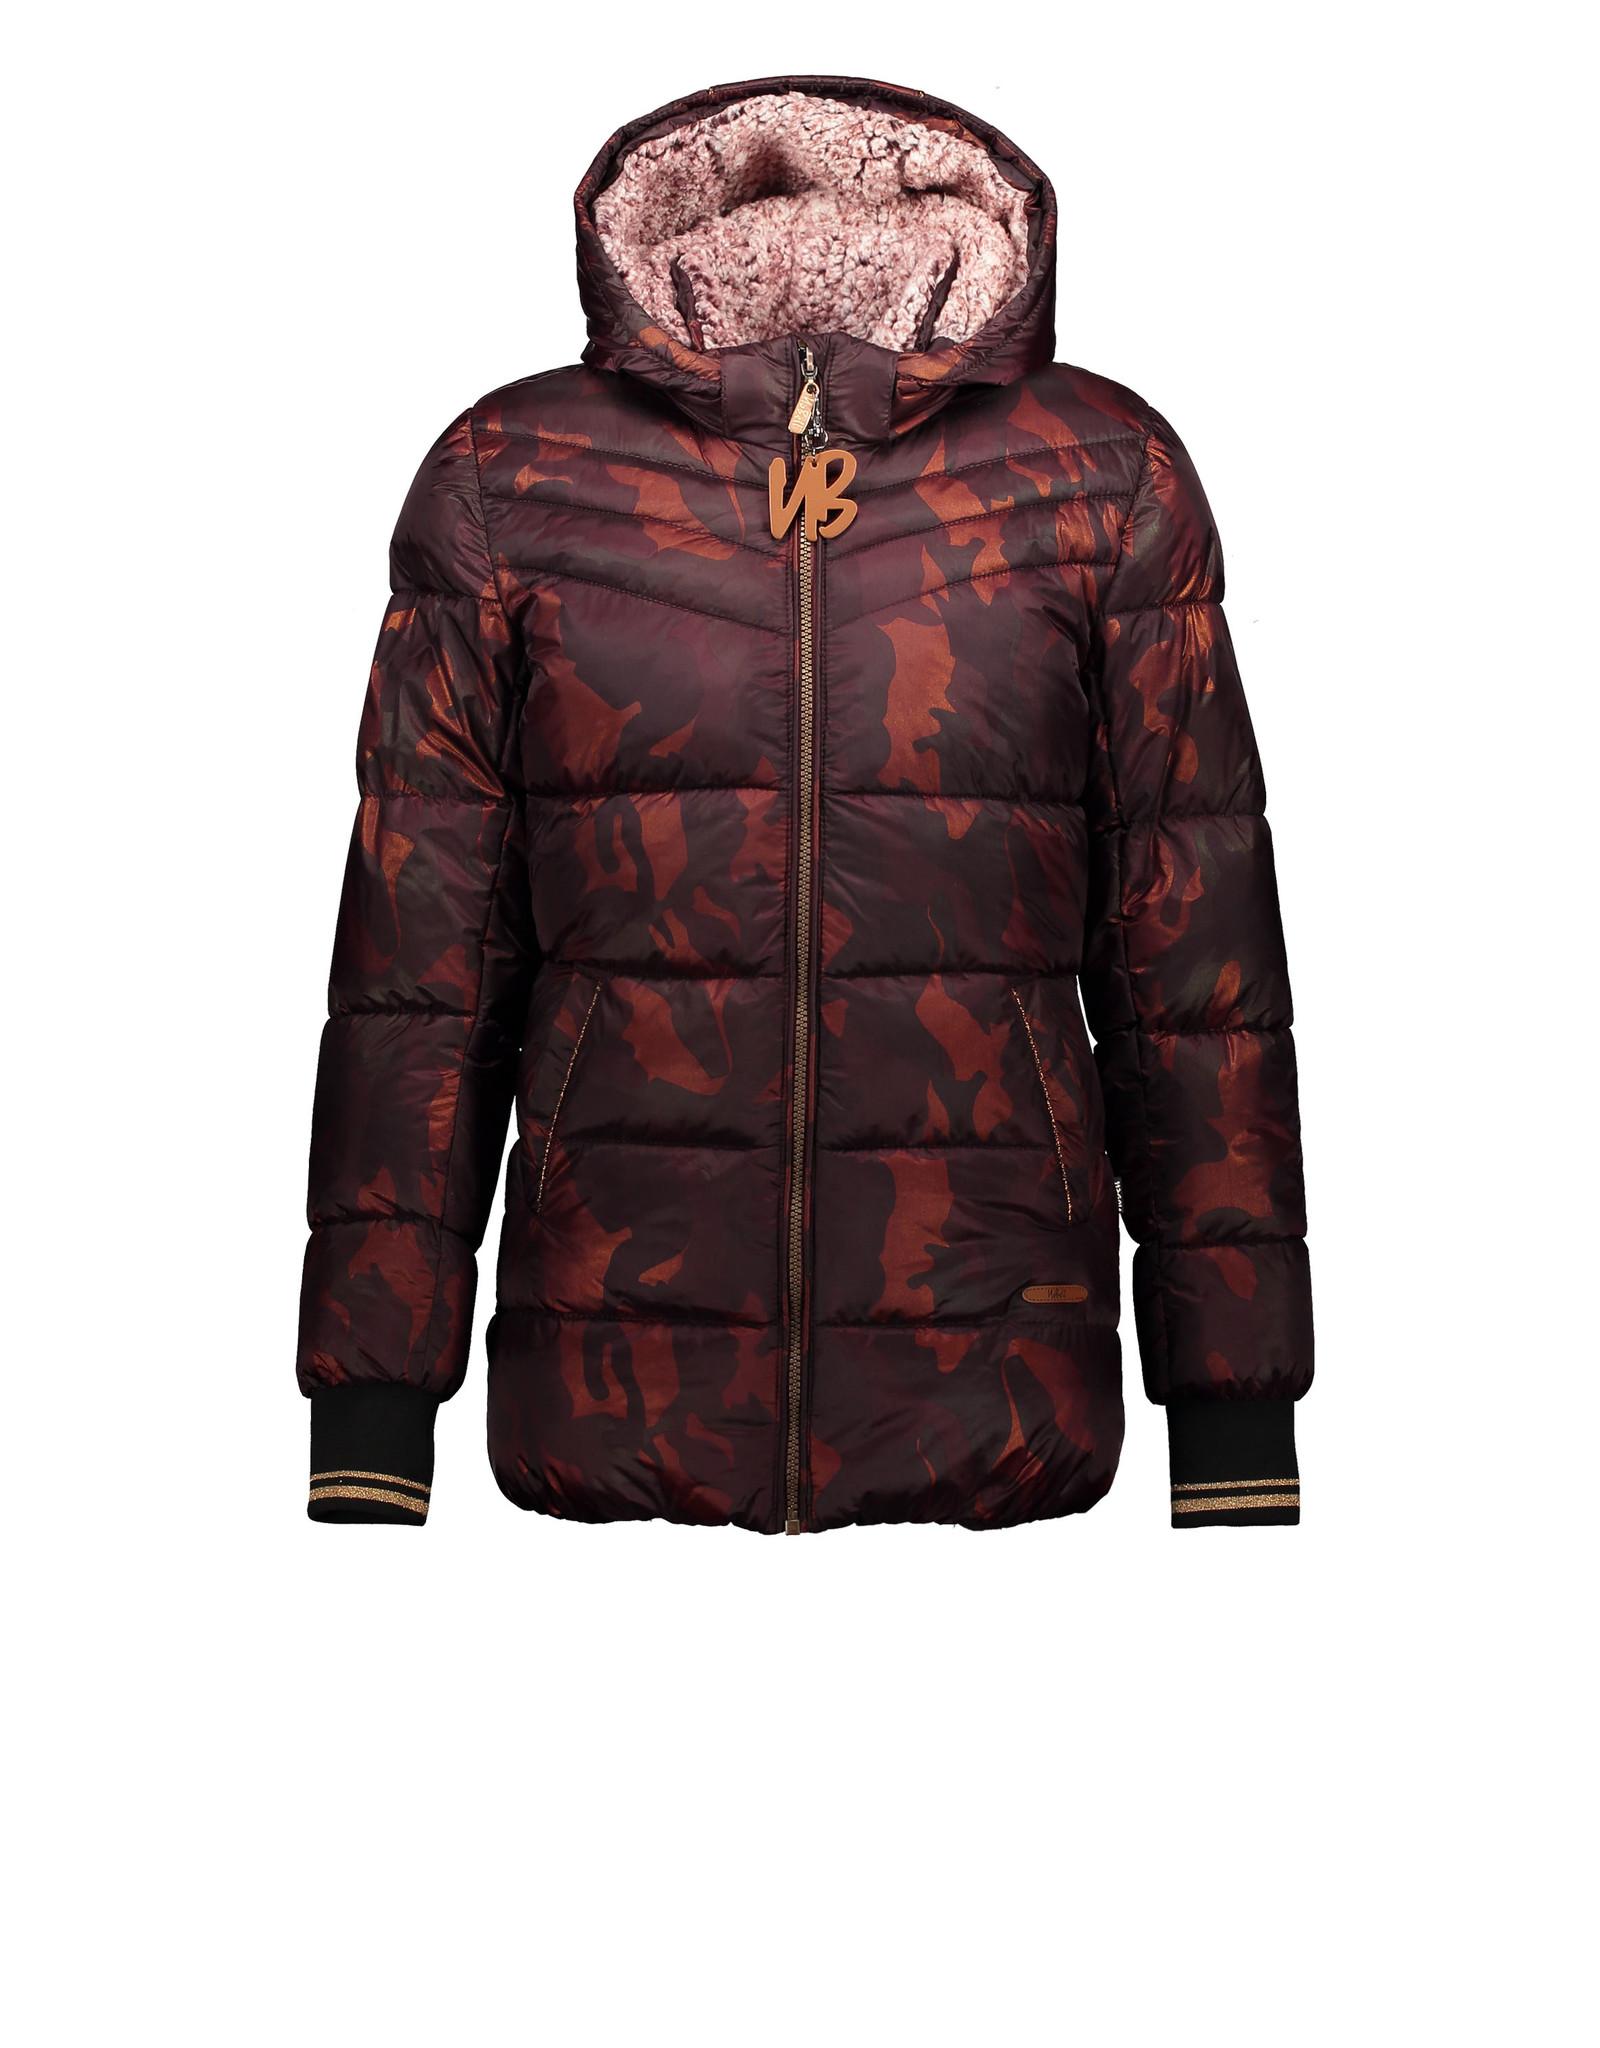 Moodstreet NoBell Babe half long stepped Hooded Jacket Antracite